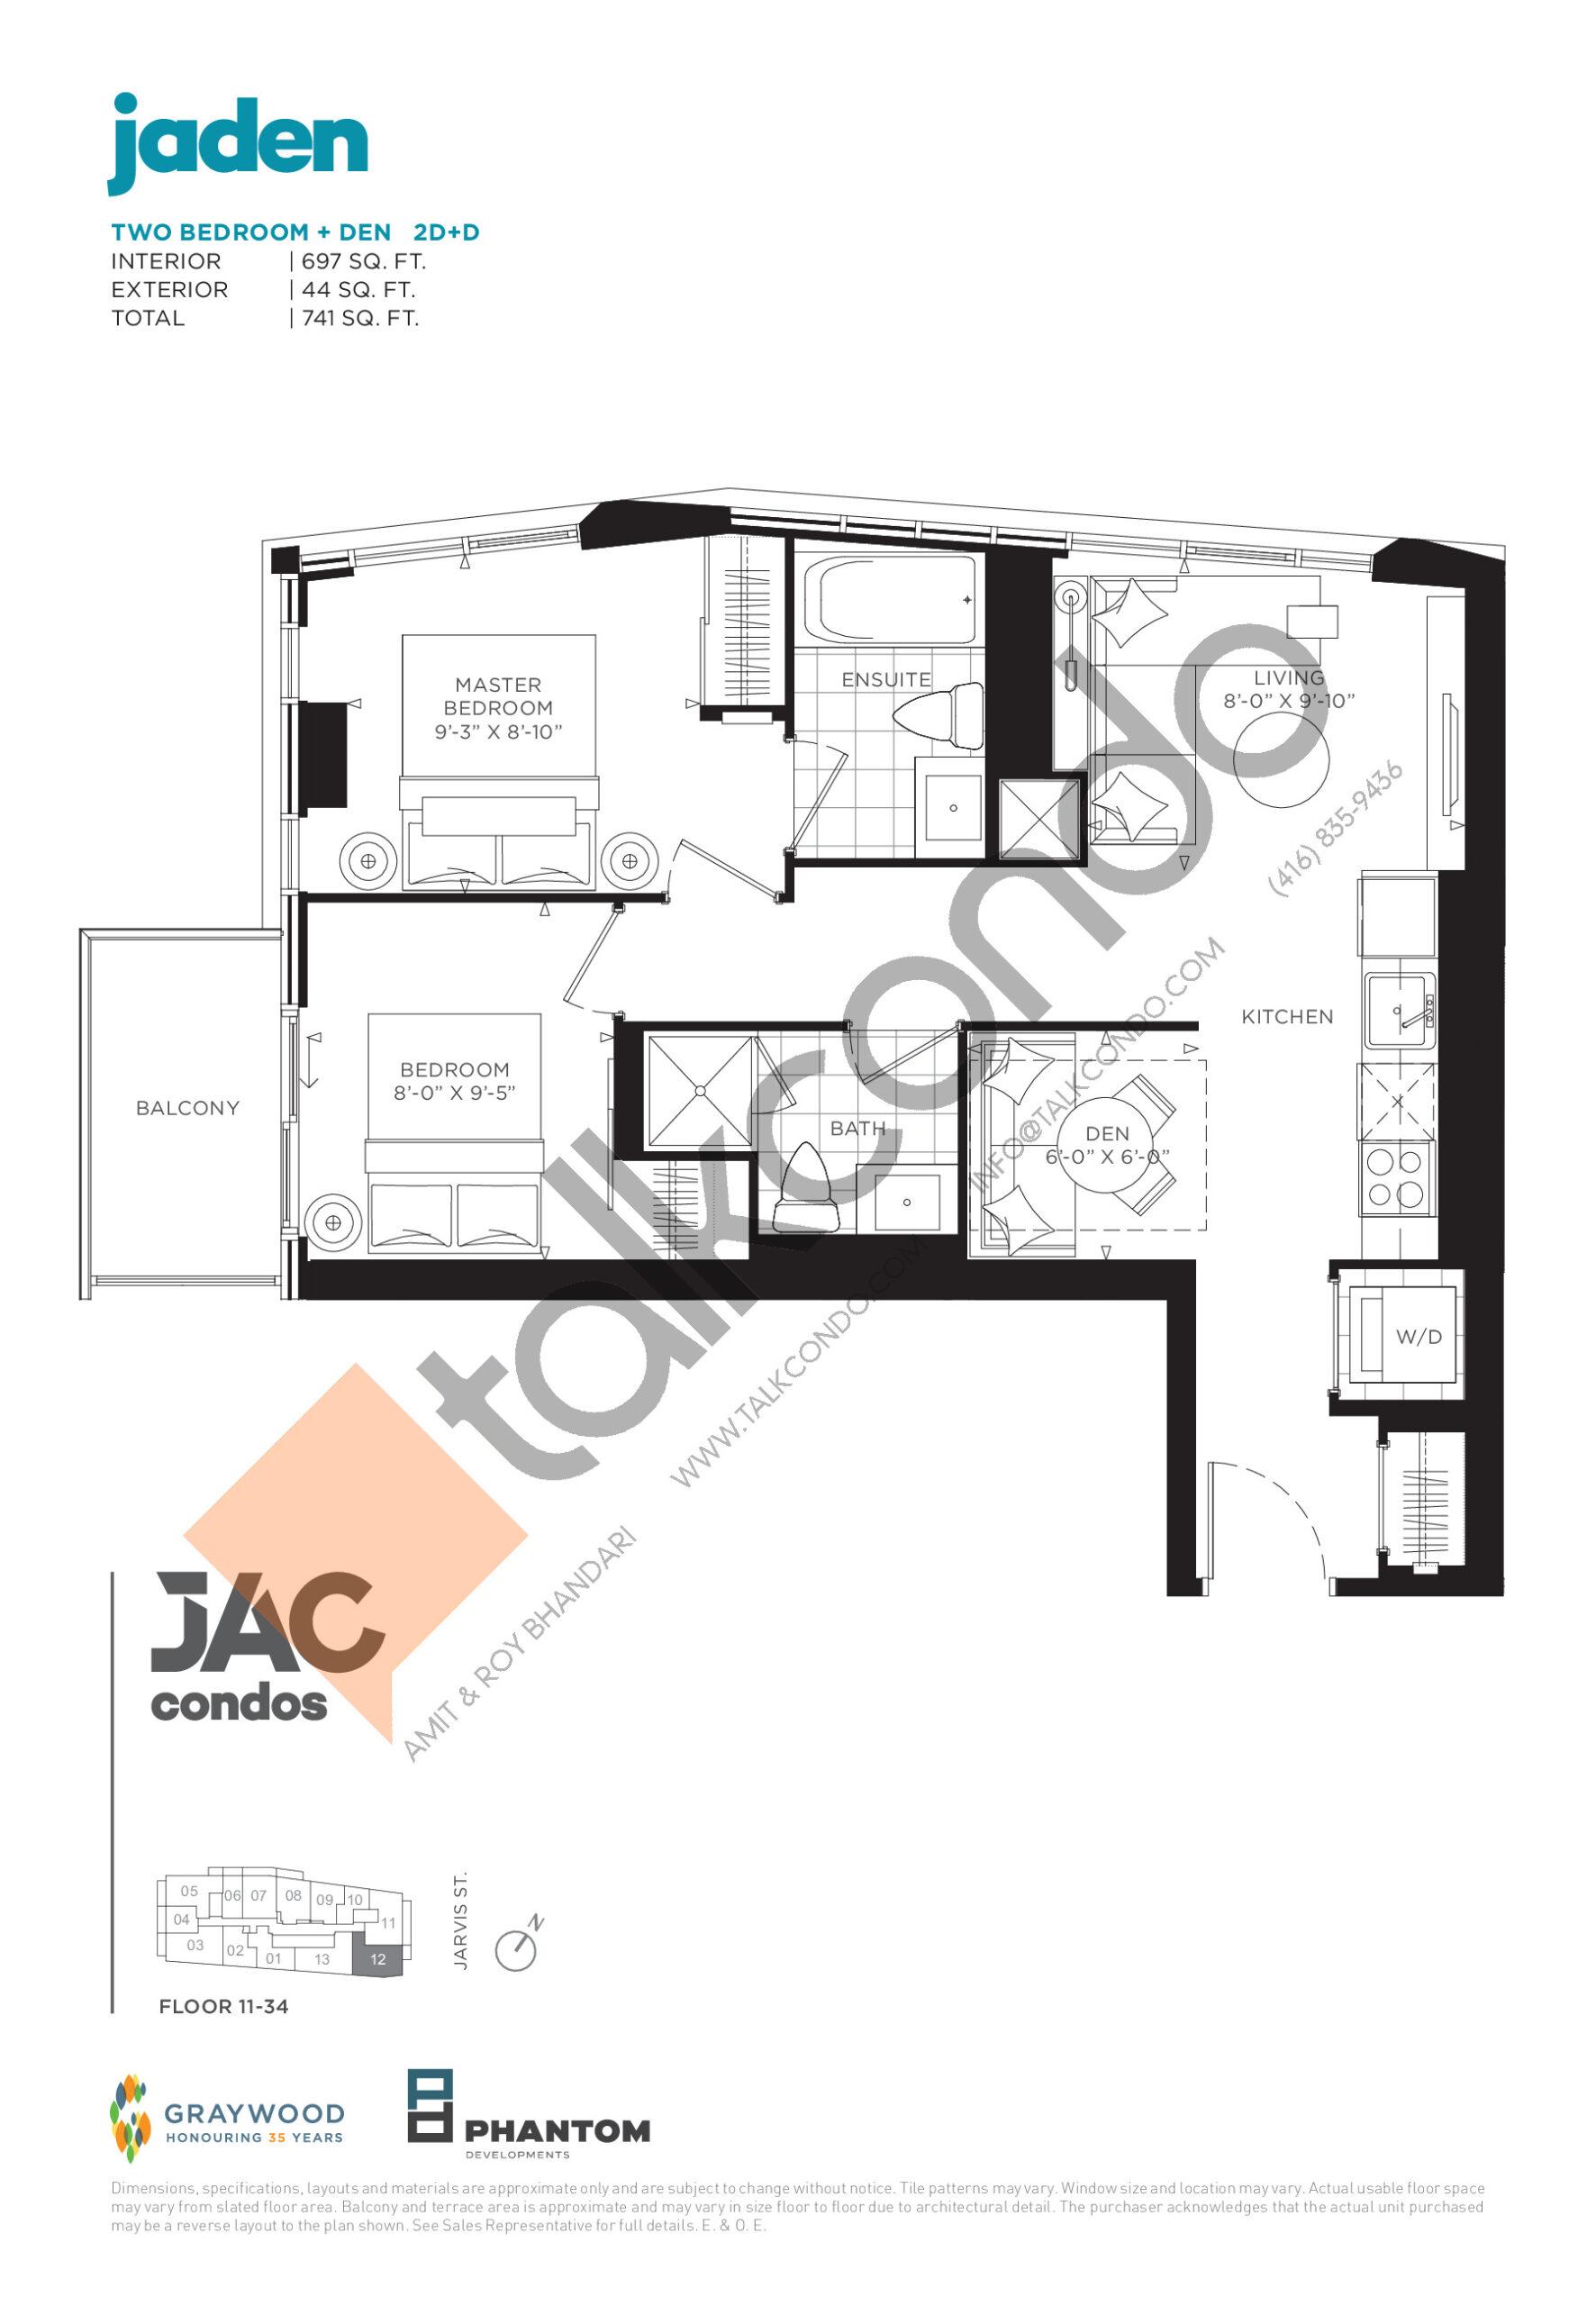 Jaden Floor Plan at JAC Condos - 697 sq.ft